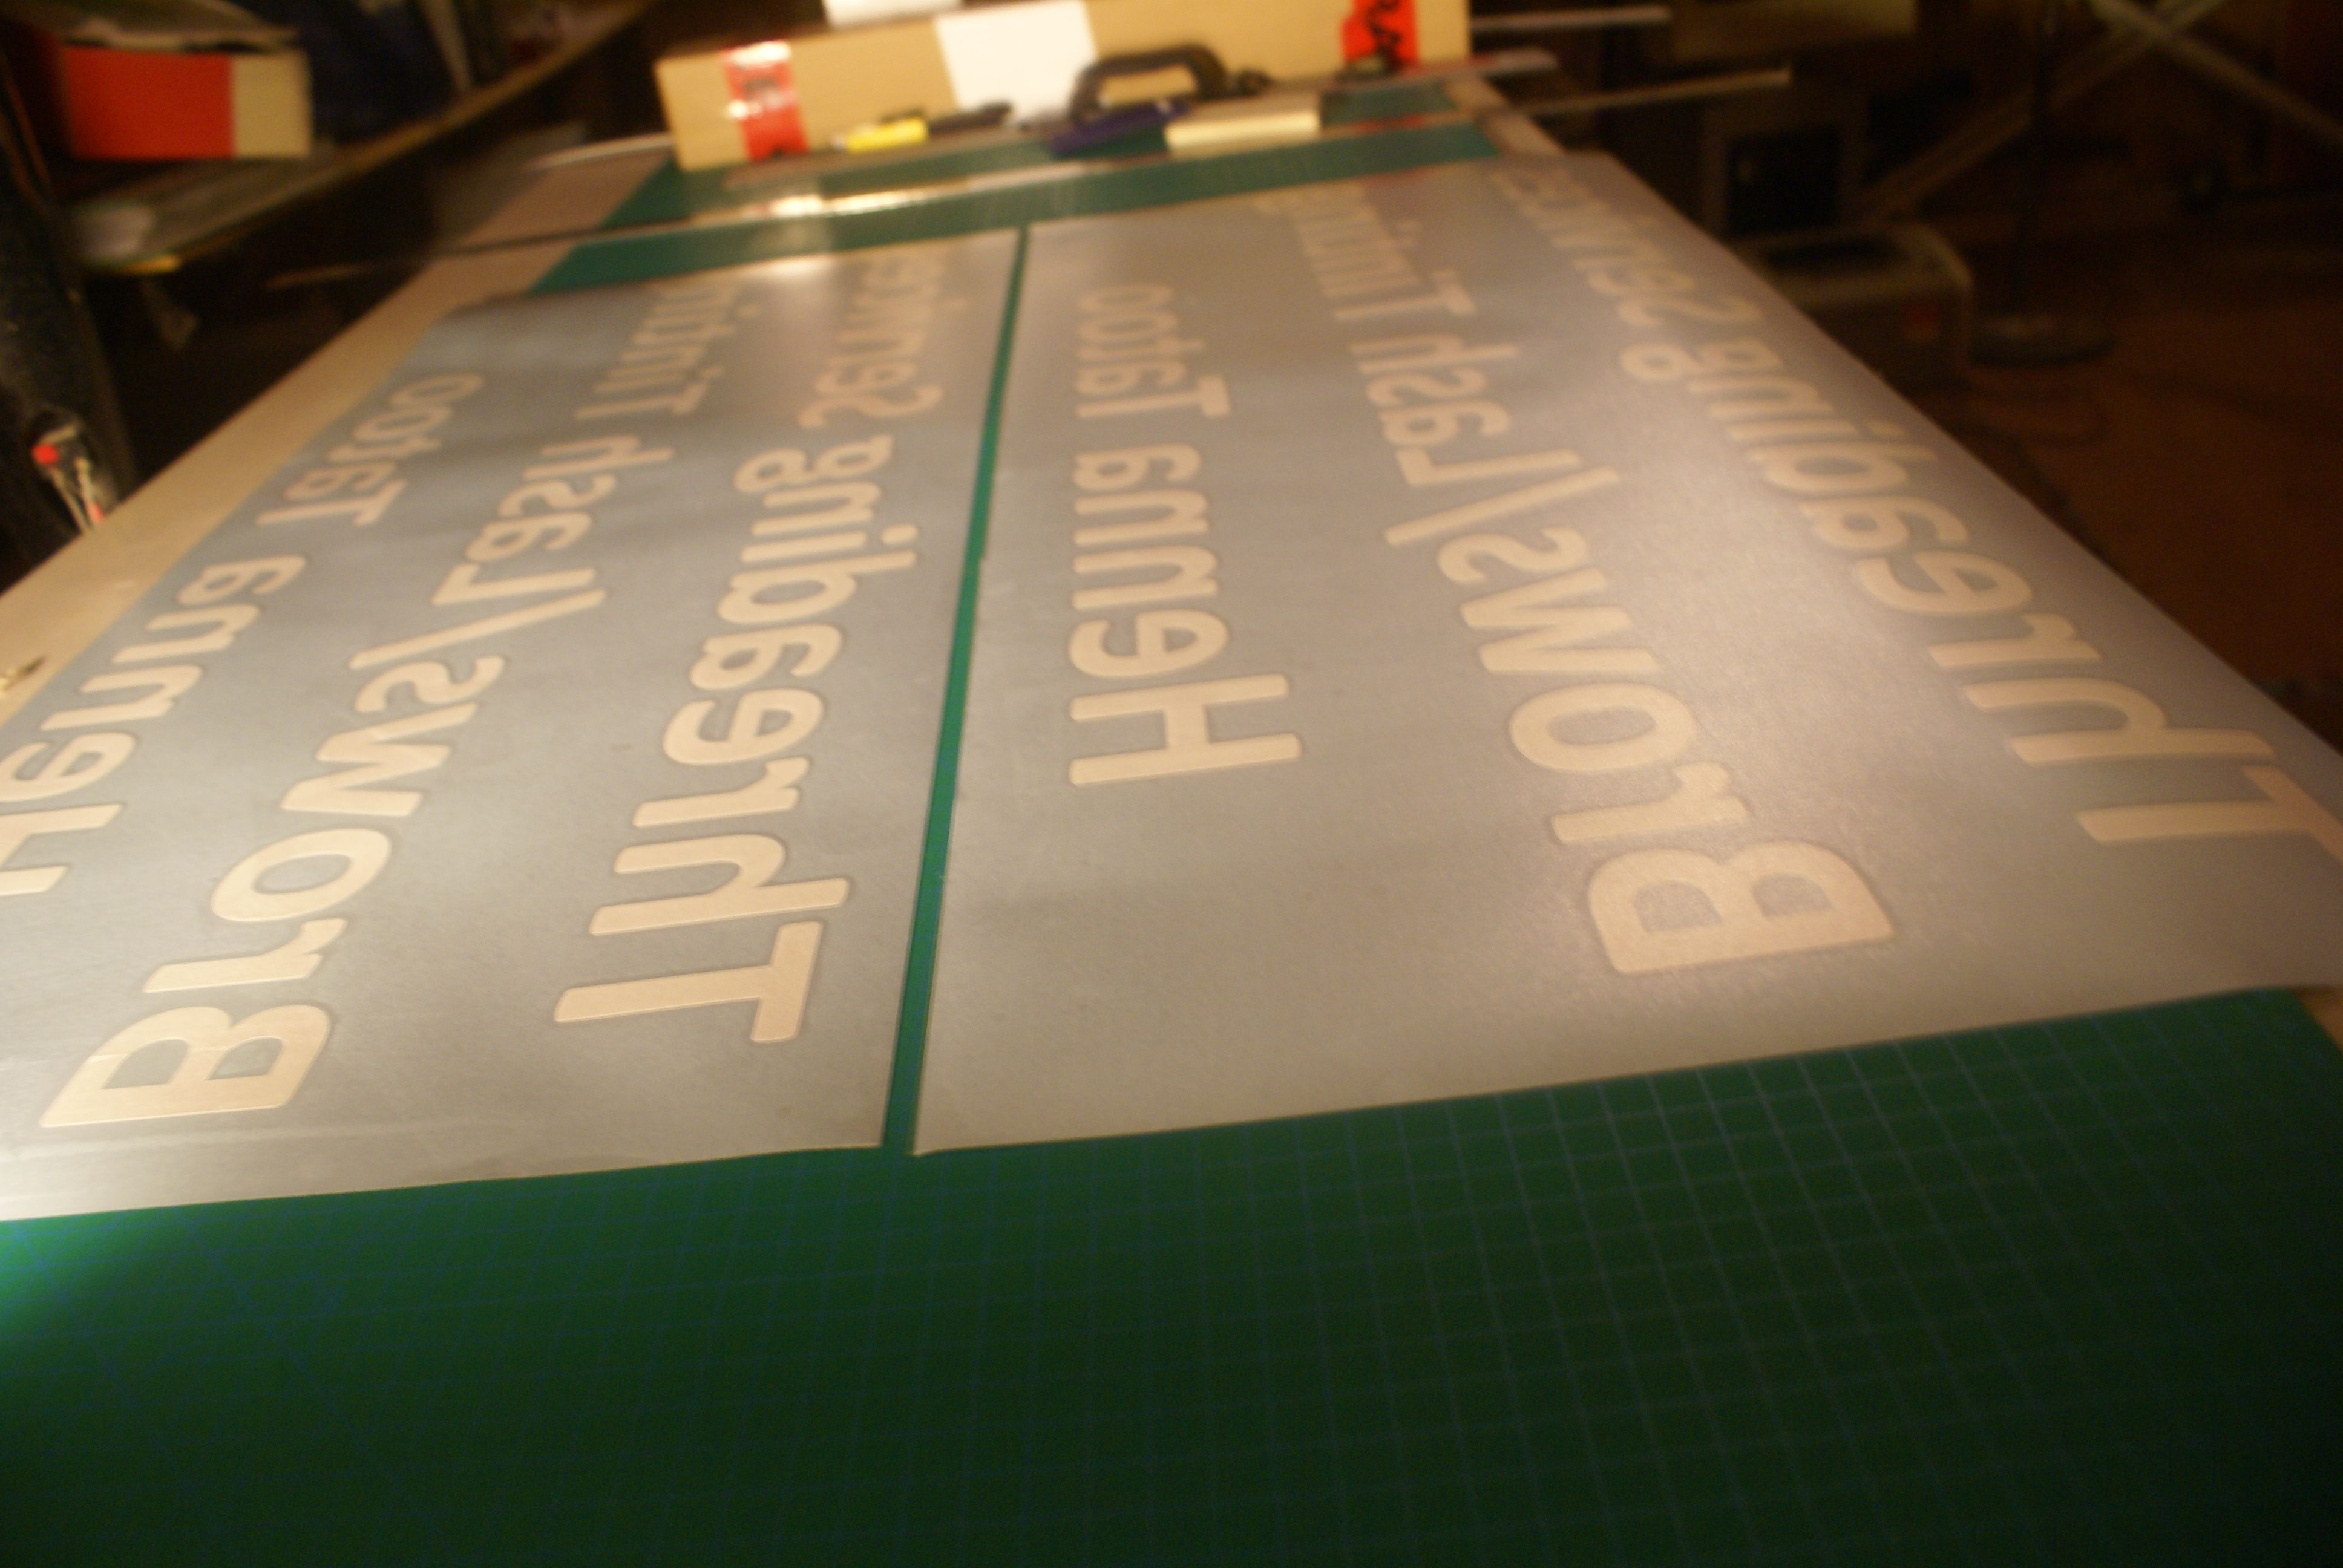 We Provide Custom Designed Self Adhesive Vinyl Signs For Shop Or - Custom vinyl adhesive signs